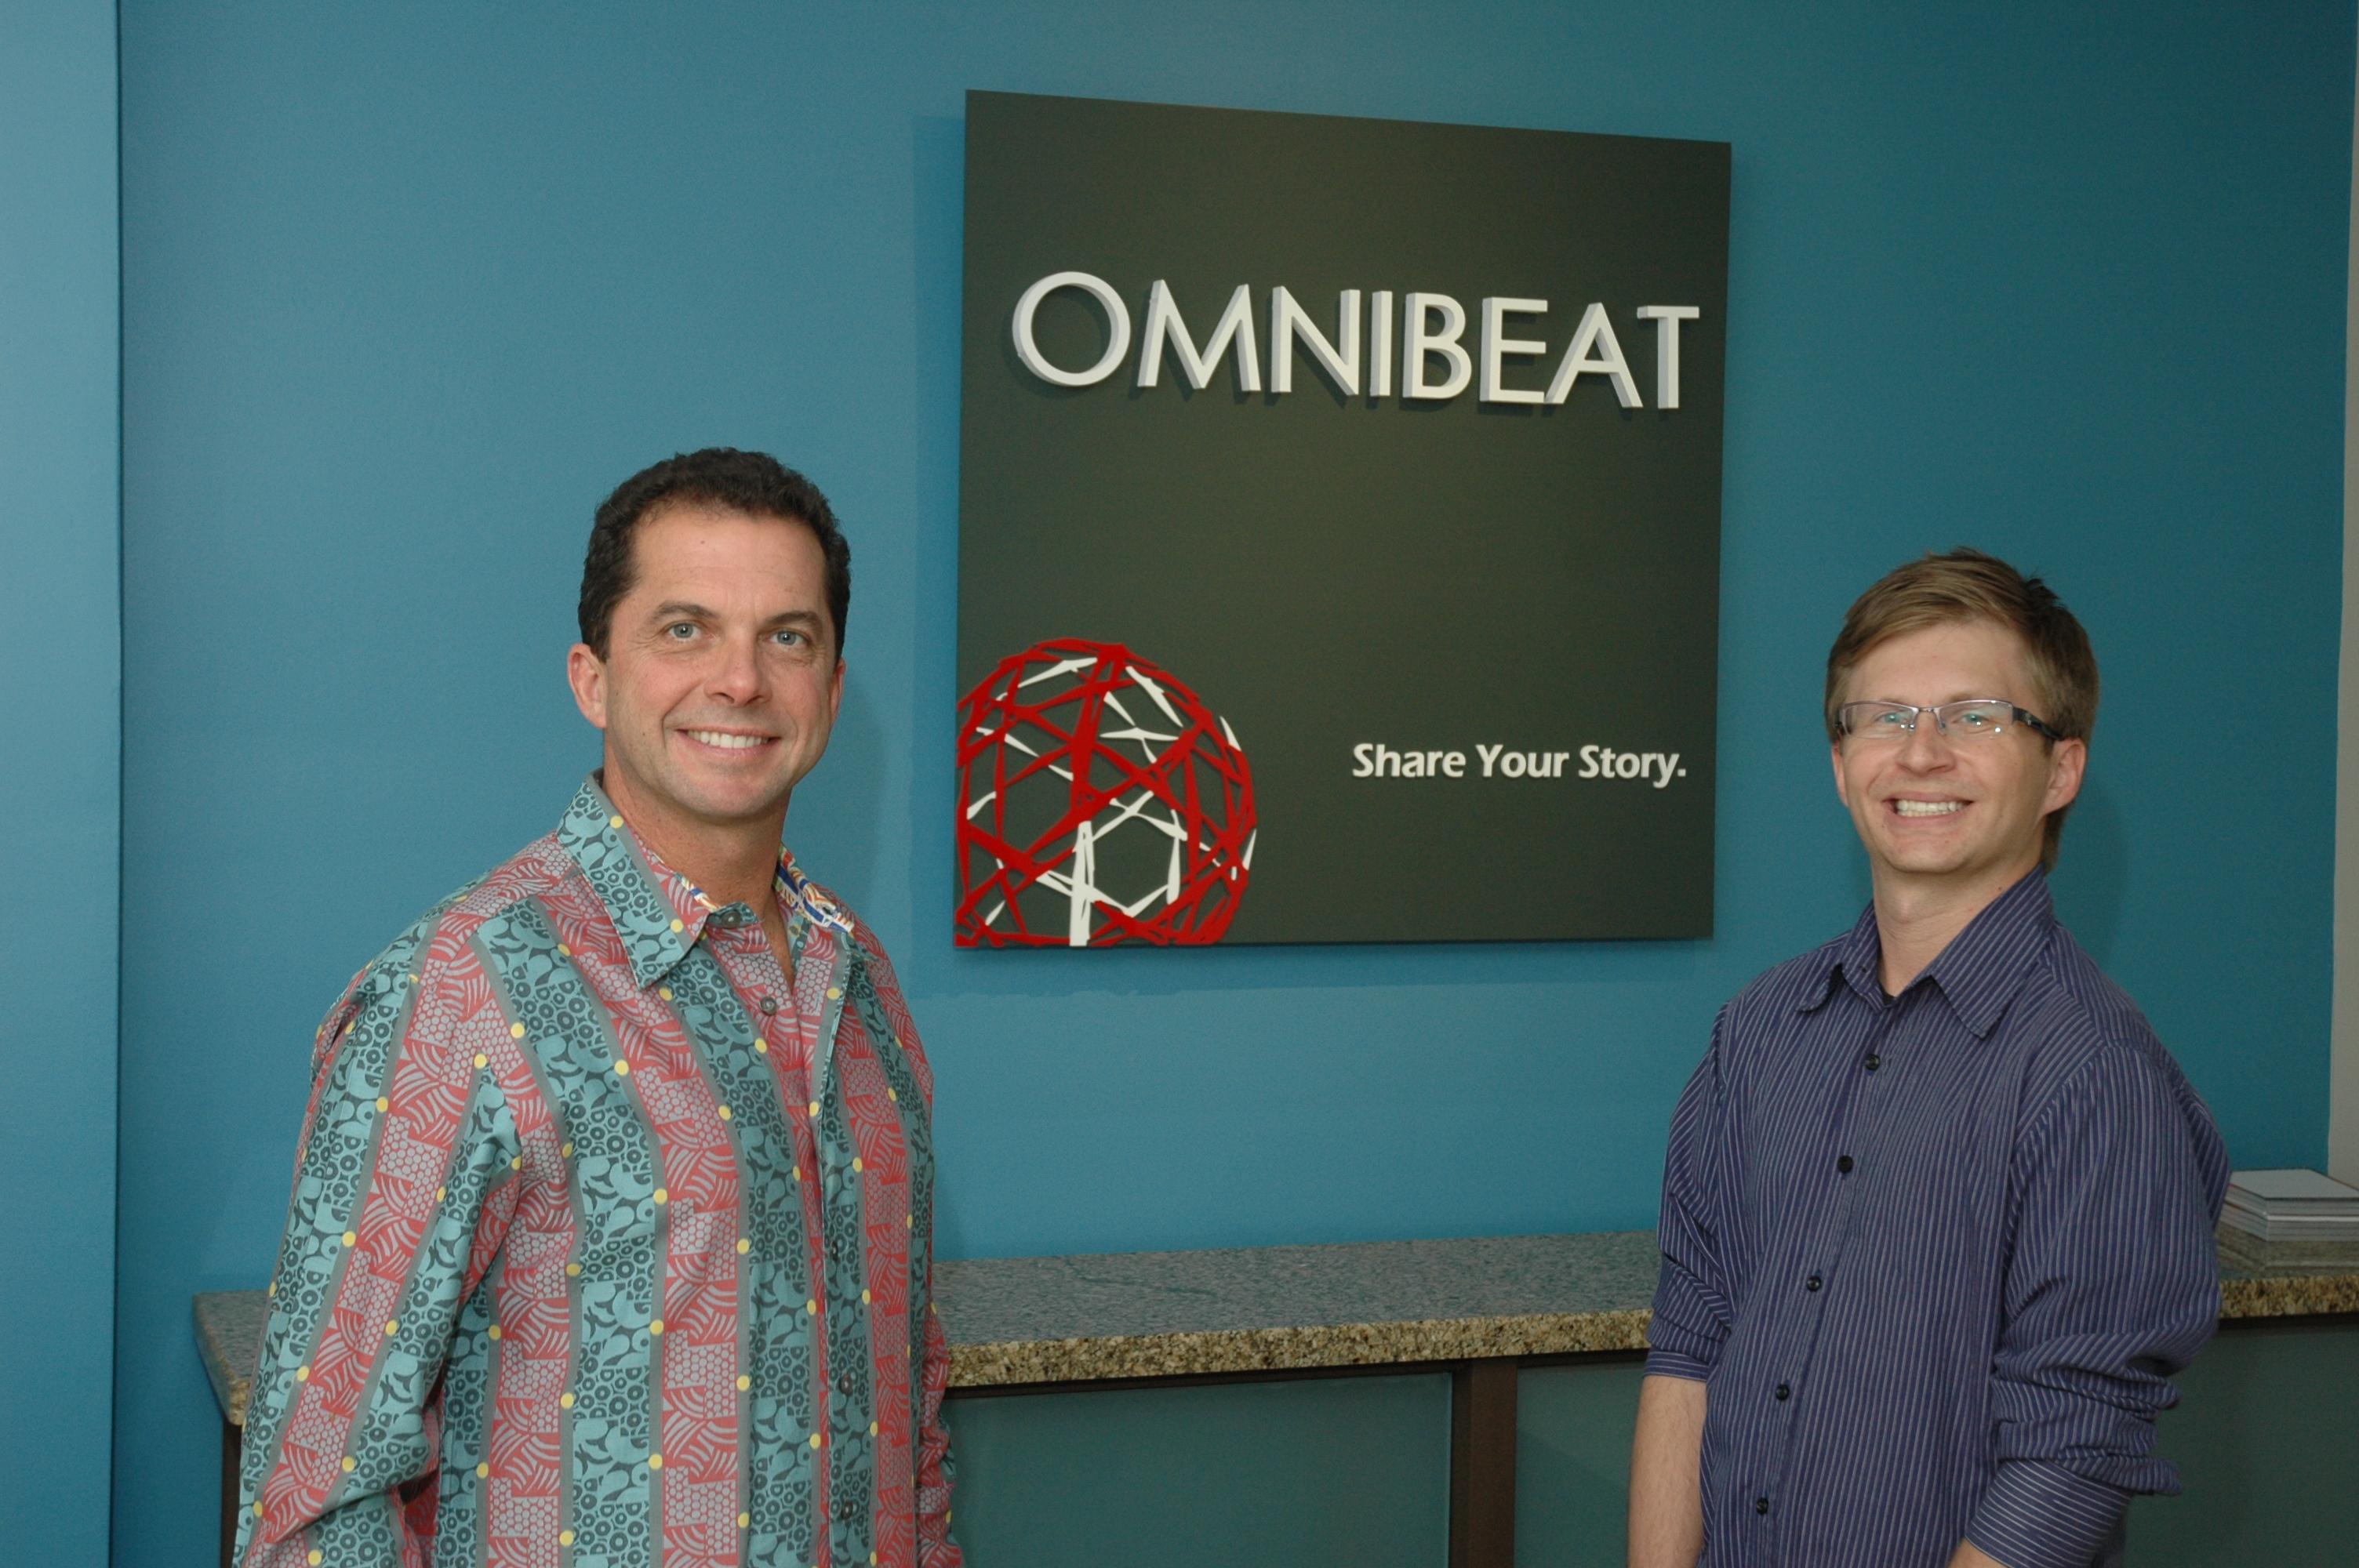 Omnibeat image 2